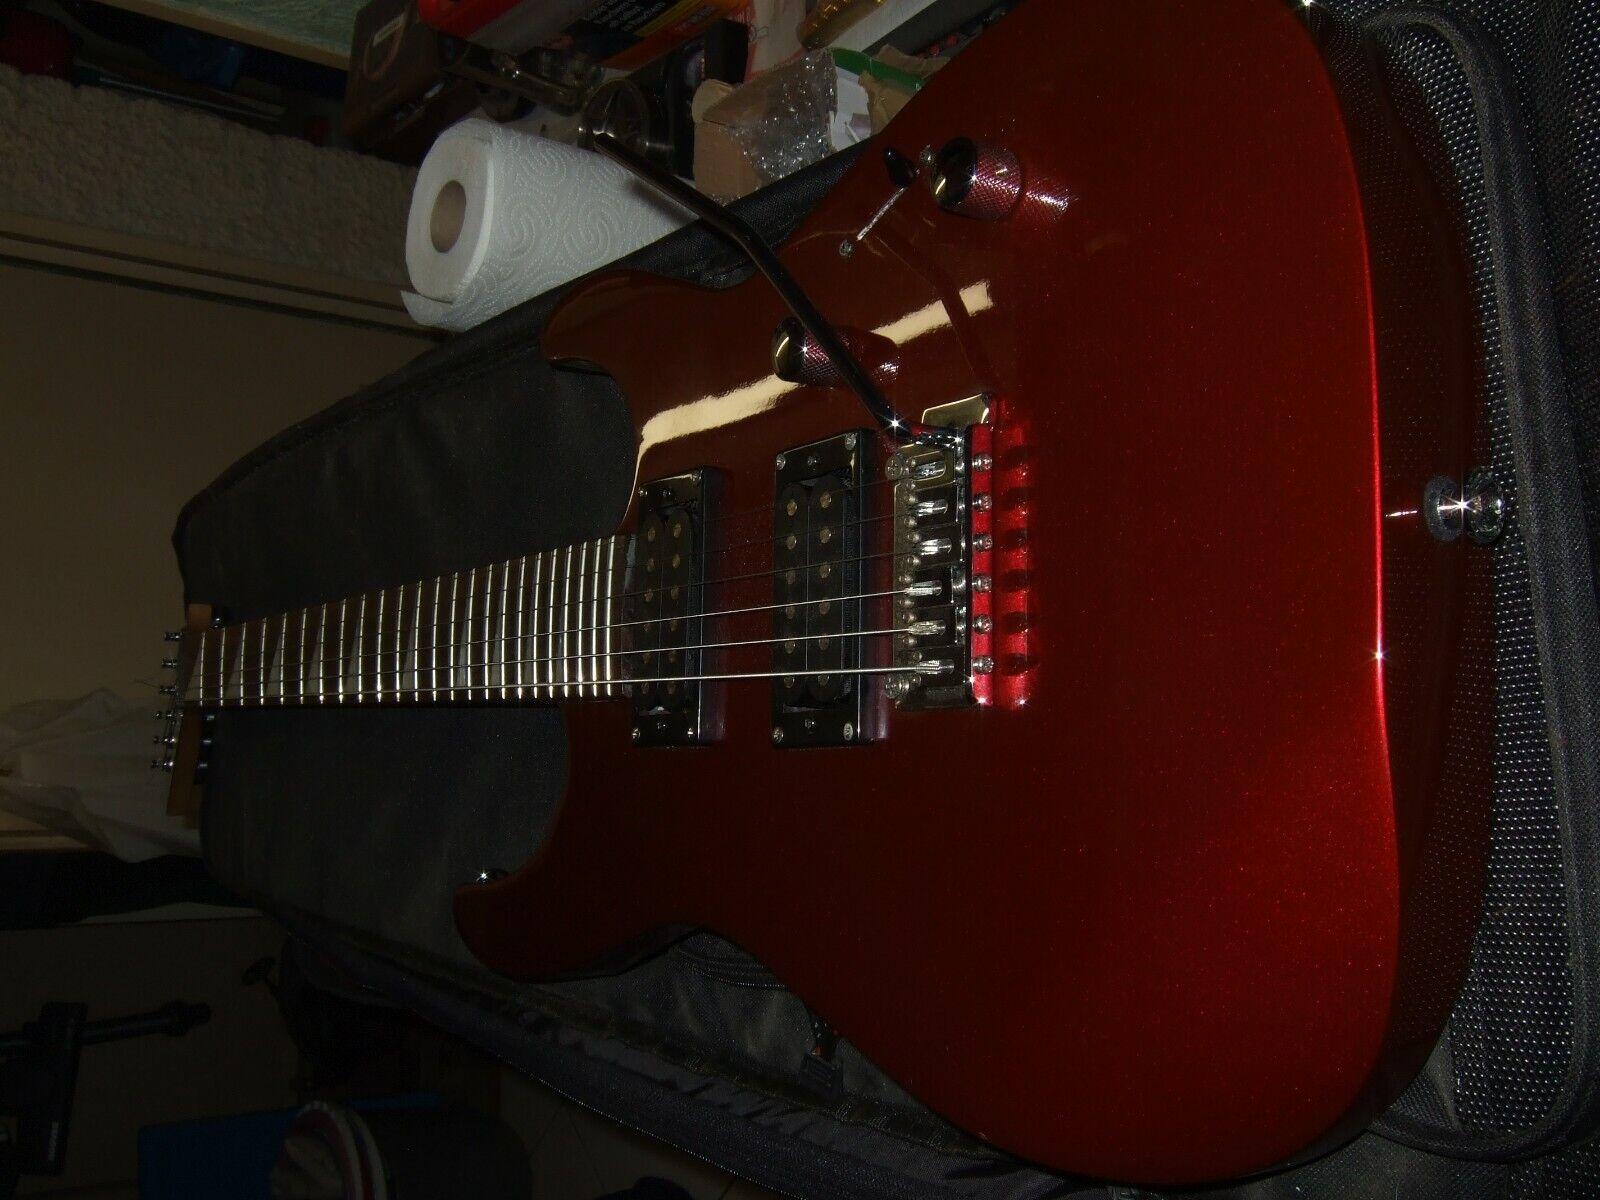 Jackson Guitar SN NHJ 1025136